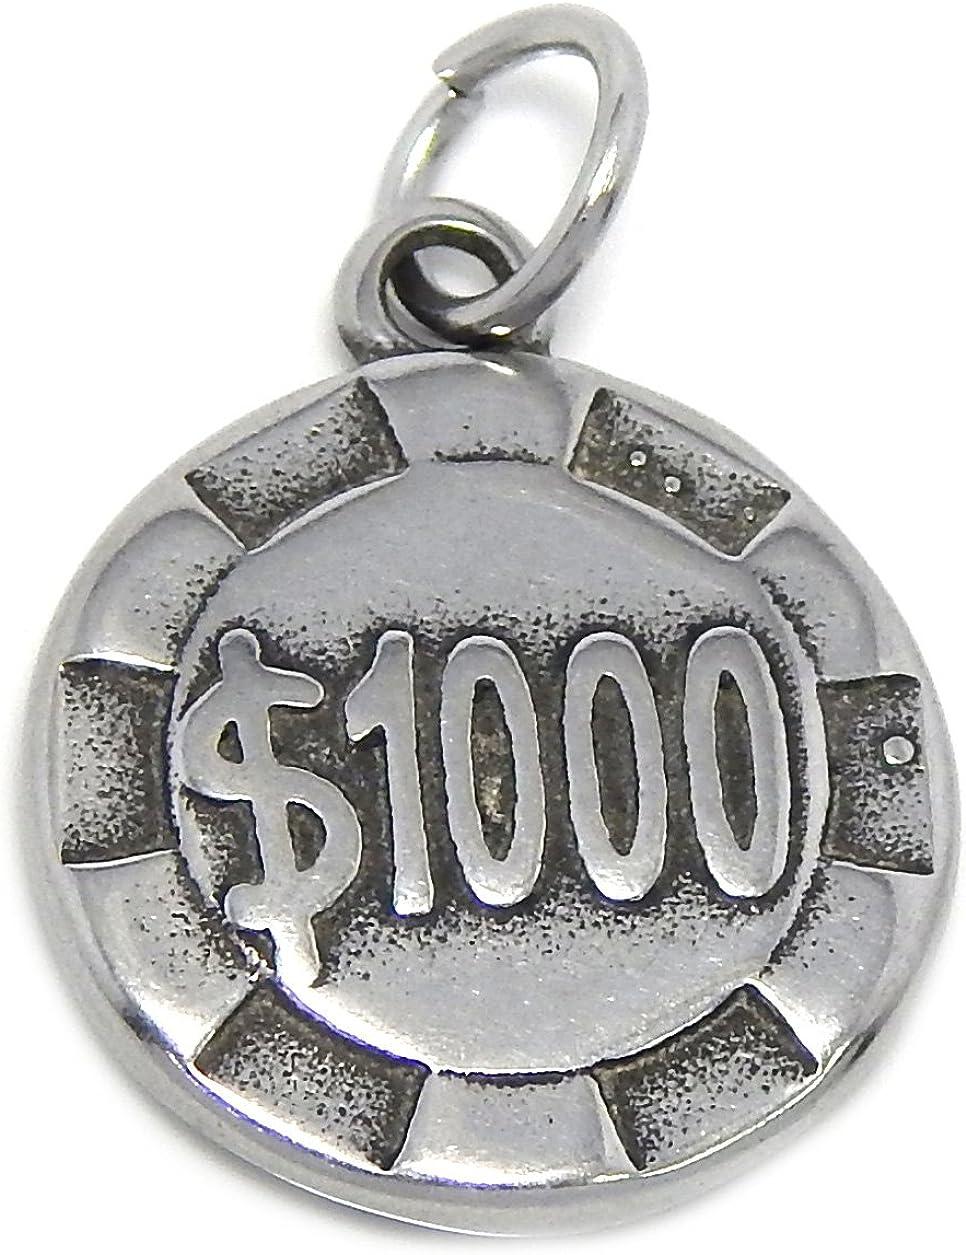 ICYROSE Stainless Steel Dangling $1000 Poker Chip Plaque Charm Bead 101 for European Snake Chain Bracelets